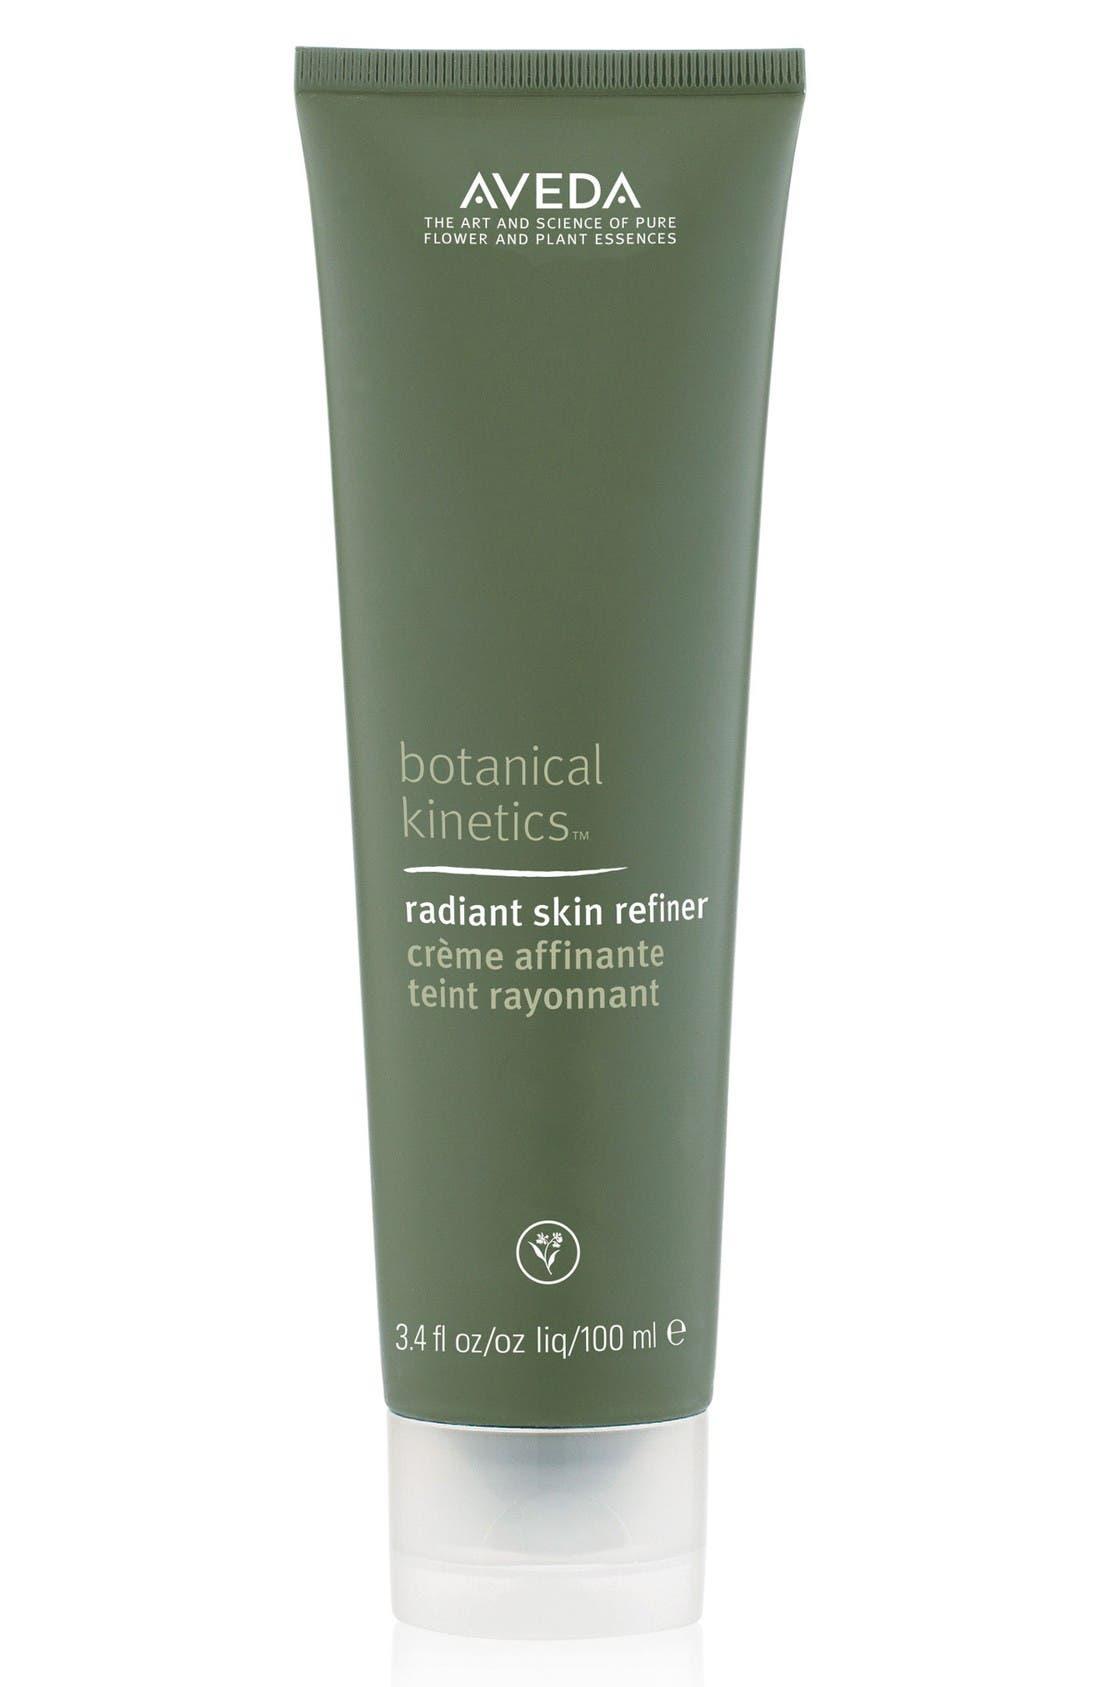 Main Image - Aveda botanical kinetics™ Radiant Skin Refiner